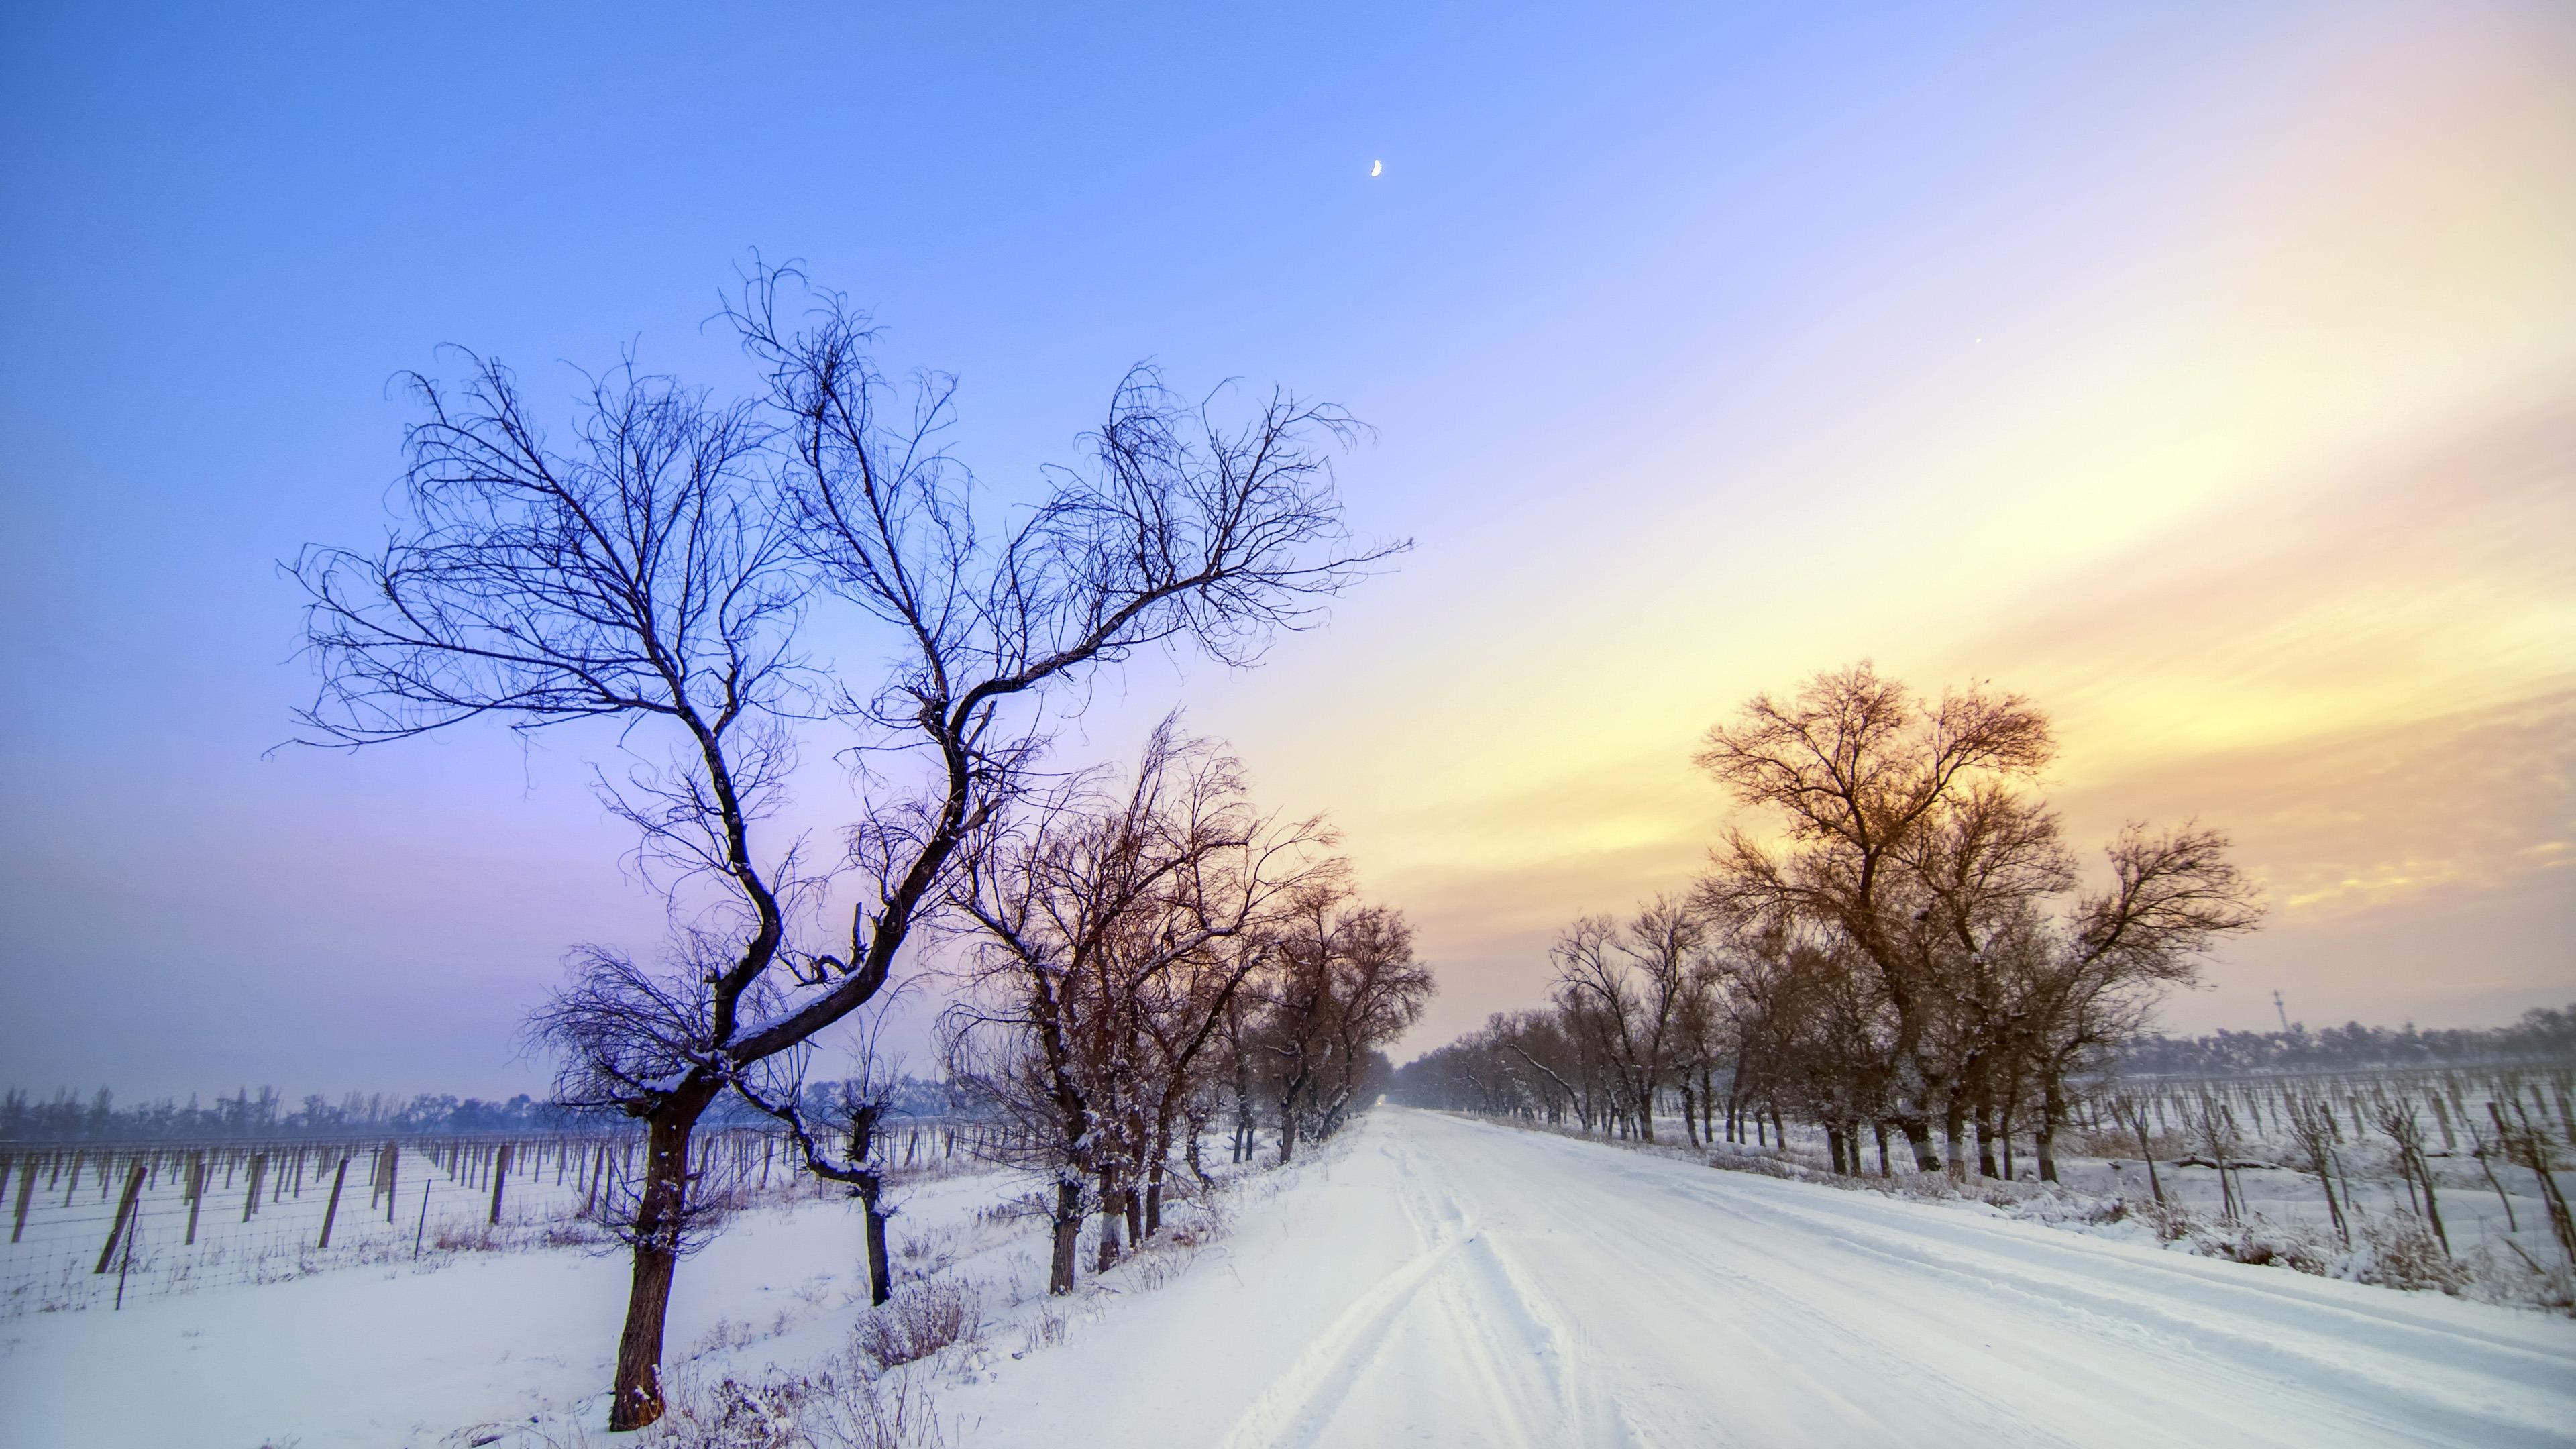 Winter Snow Road Sunset Scenery Wallpaper Nature 3840x2160 Wallpaper Teahub Io